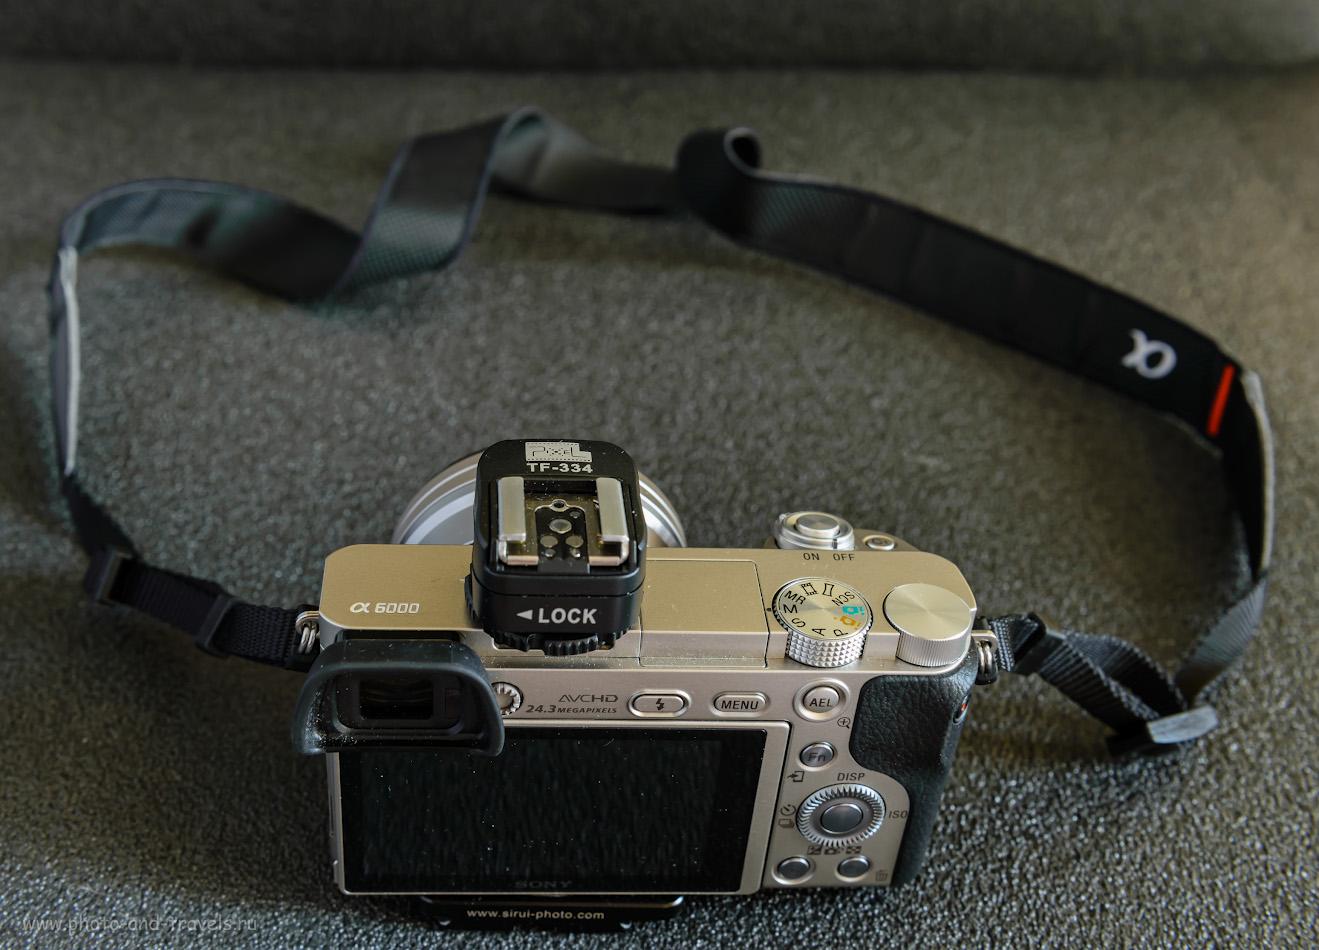 Фото 2. Так выглядит беззеркалка Sony A6000 с переходником для «горячего башмака» с Nikon на Sony Pixel TF-334.